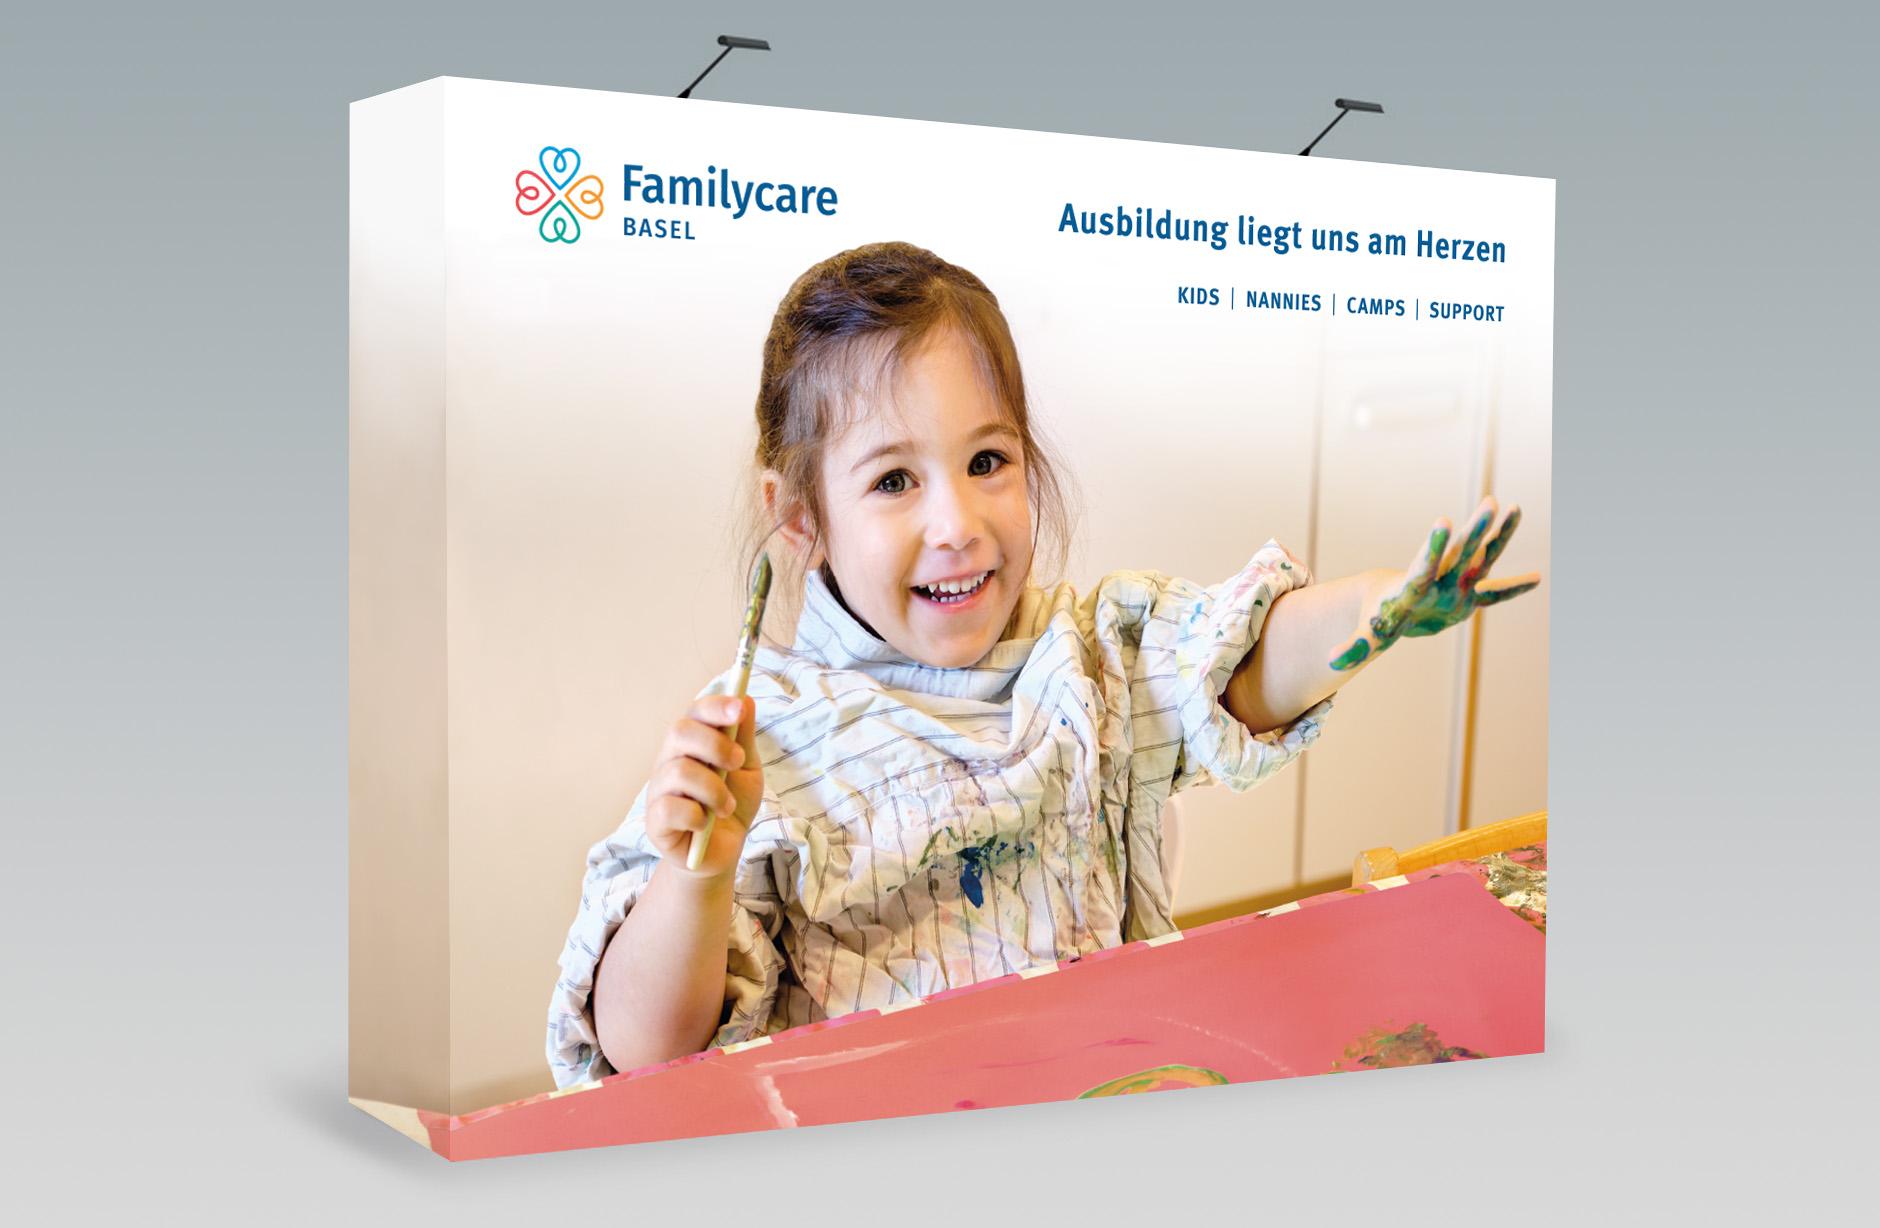 Familycare Basel Messewand – Newsign Grafik